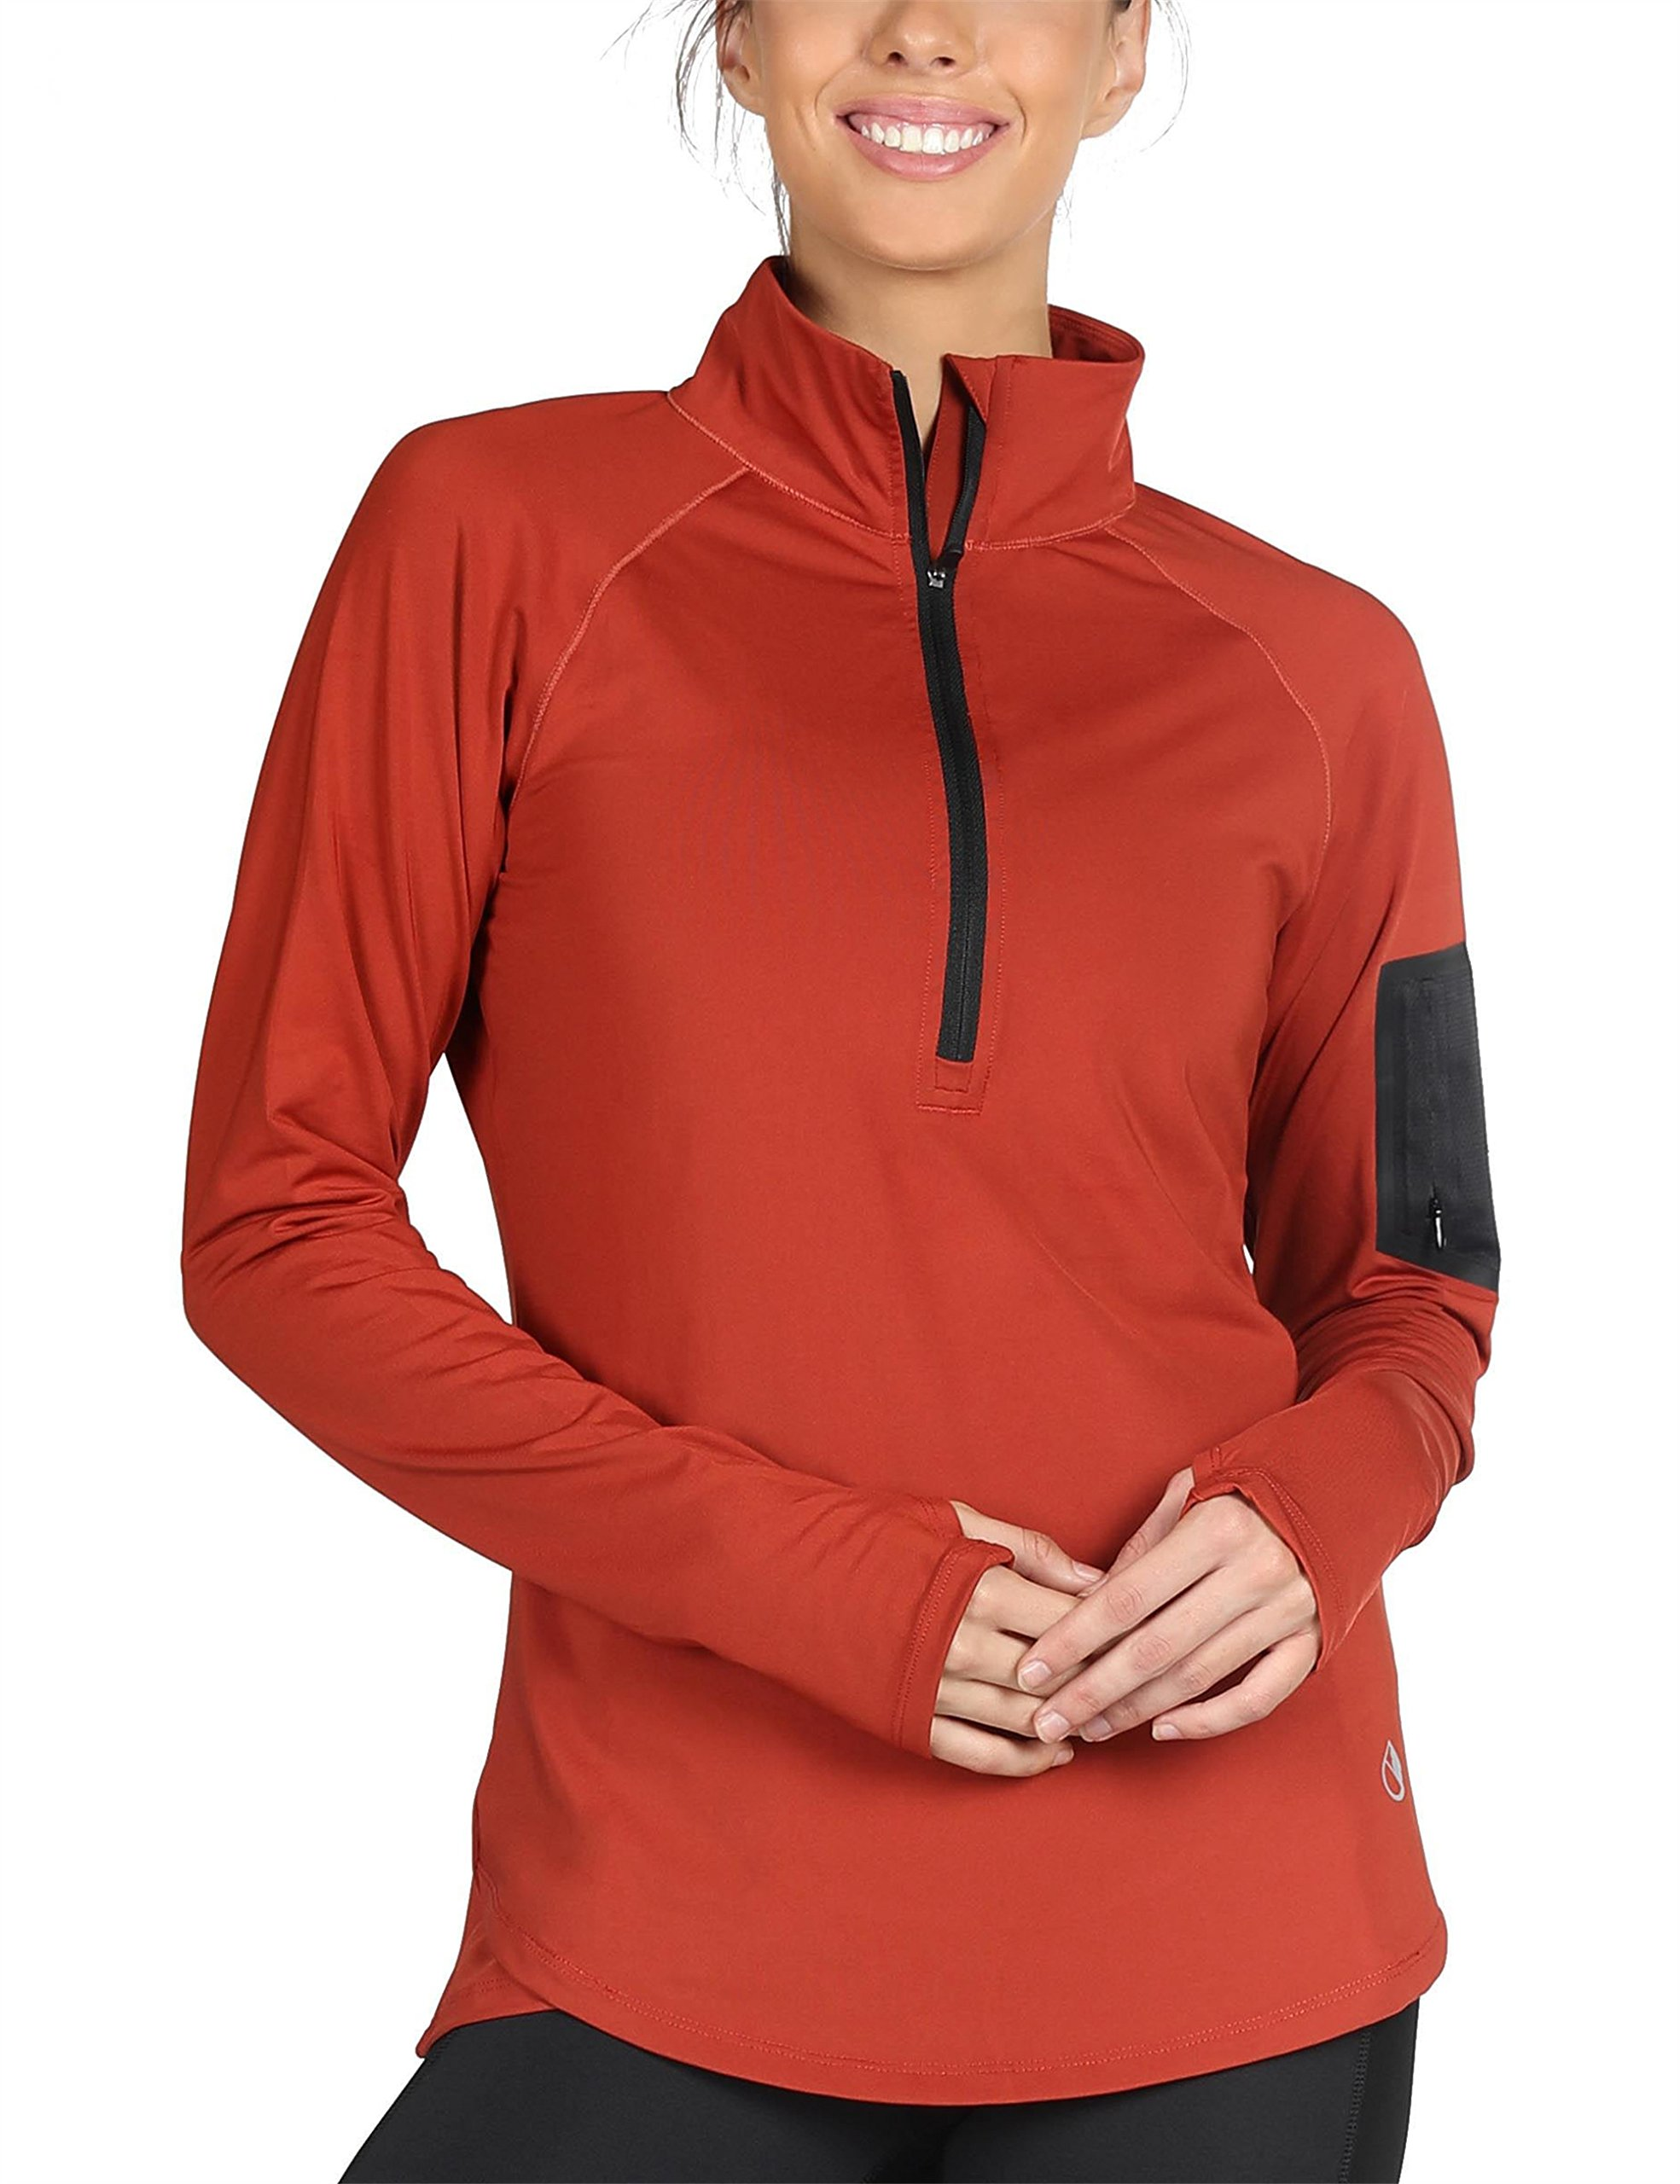 icyzone Women\'s Workout Yoga Track Jacket 1/2 Zip Long Sleeve Running Shirt (XL, Persimmom)